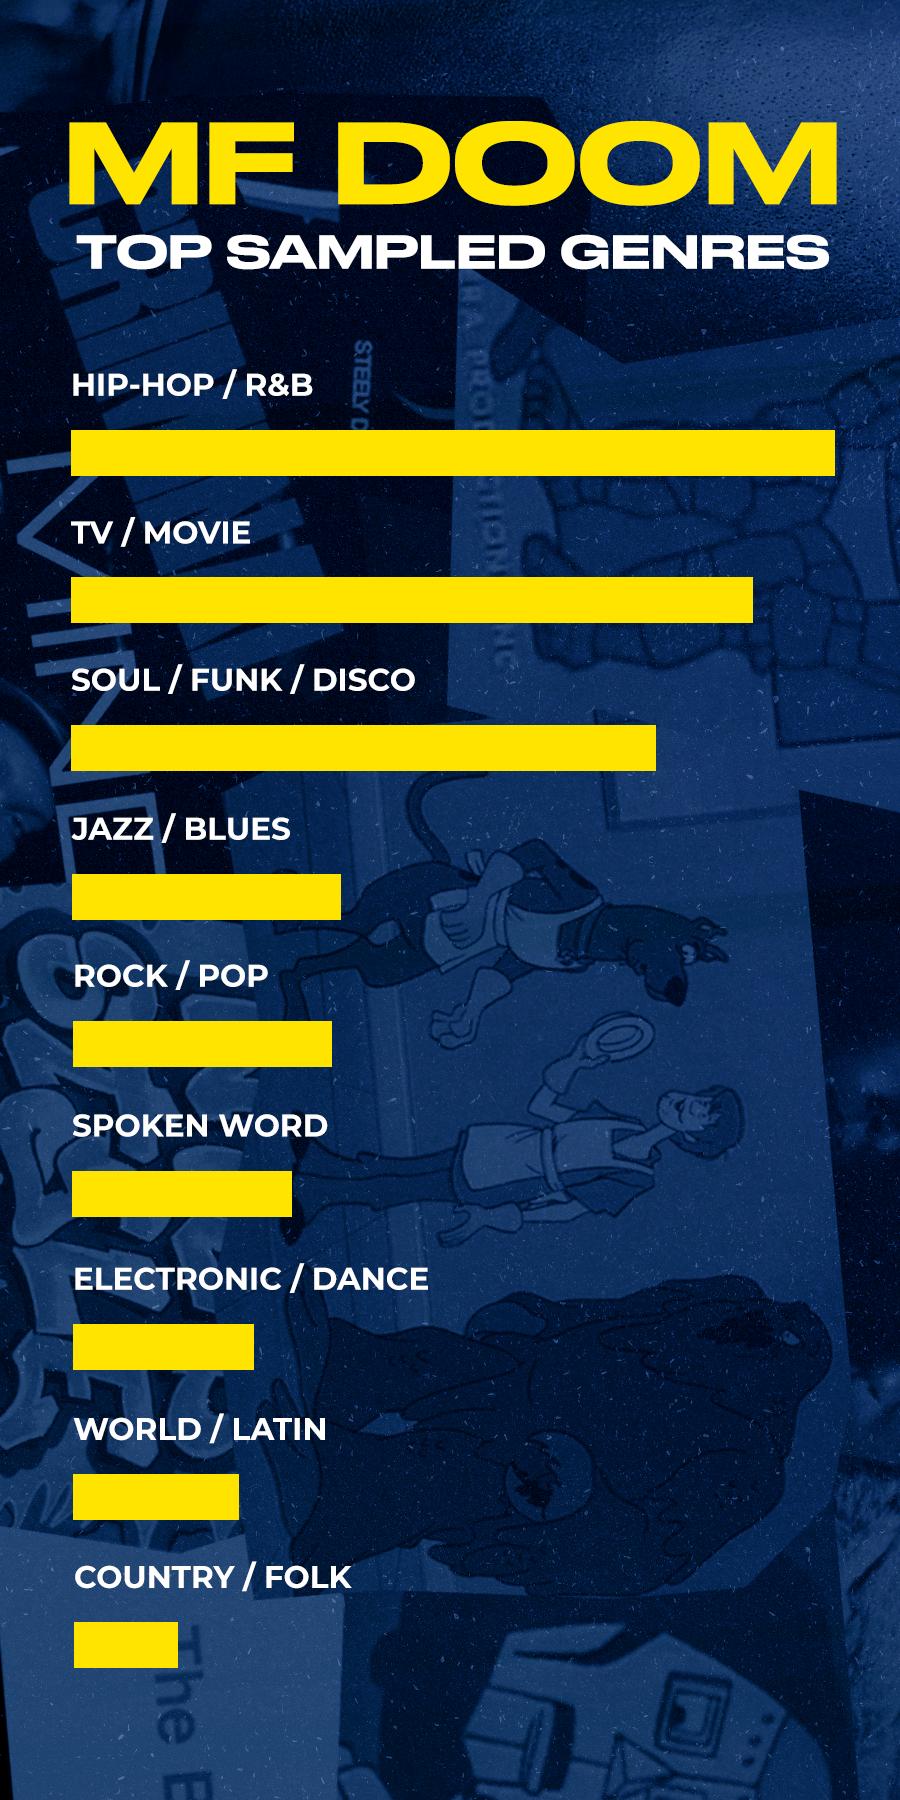 mf doom samples by genre